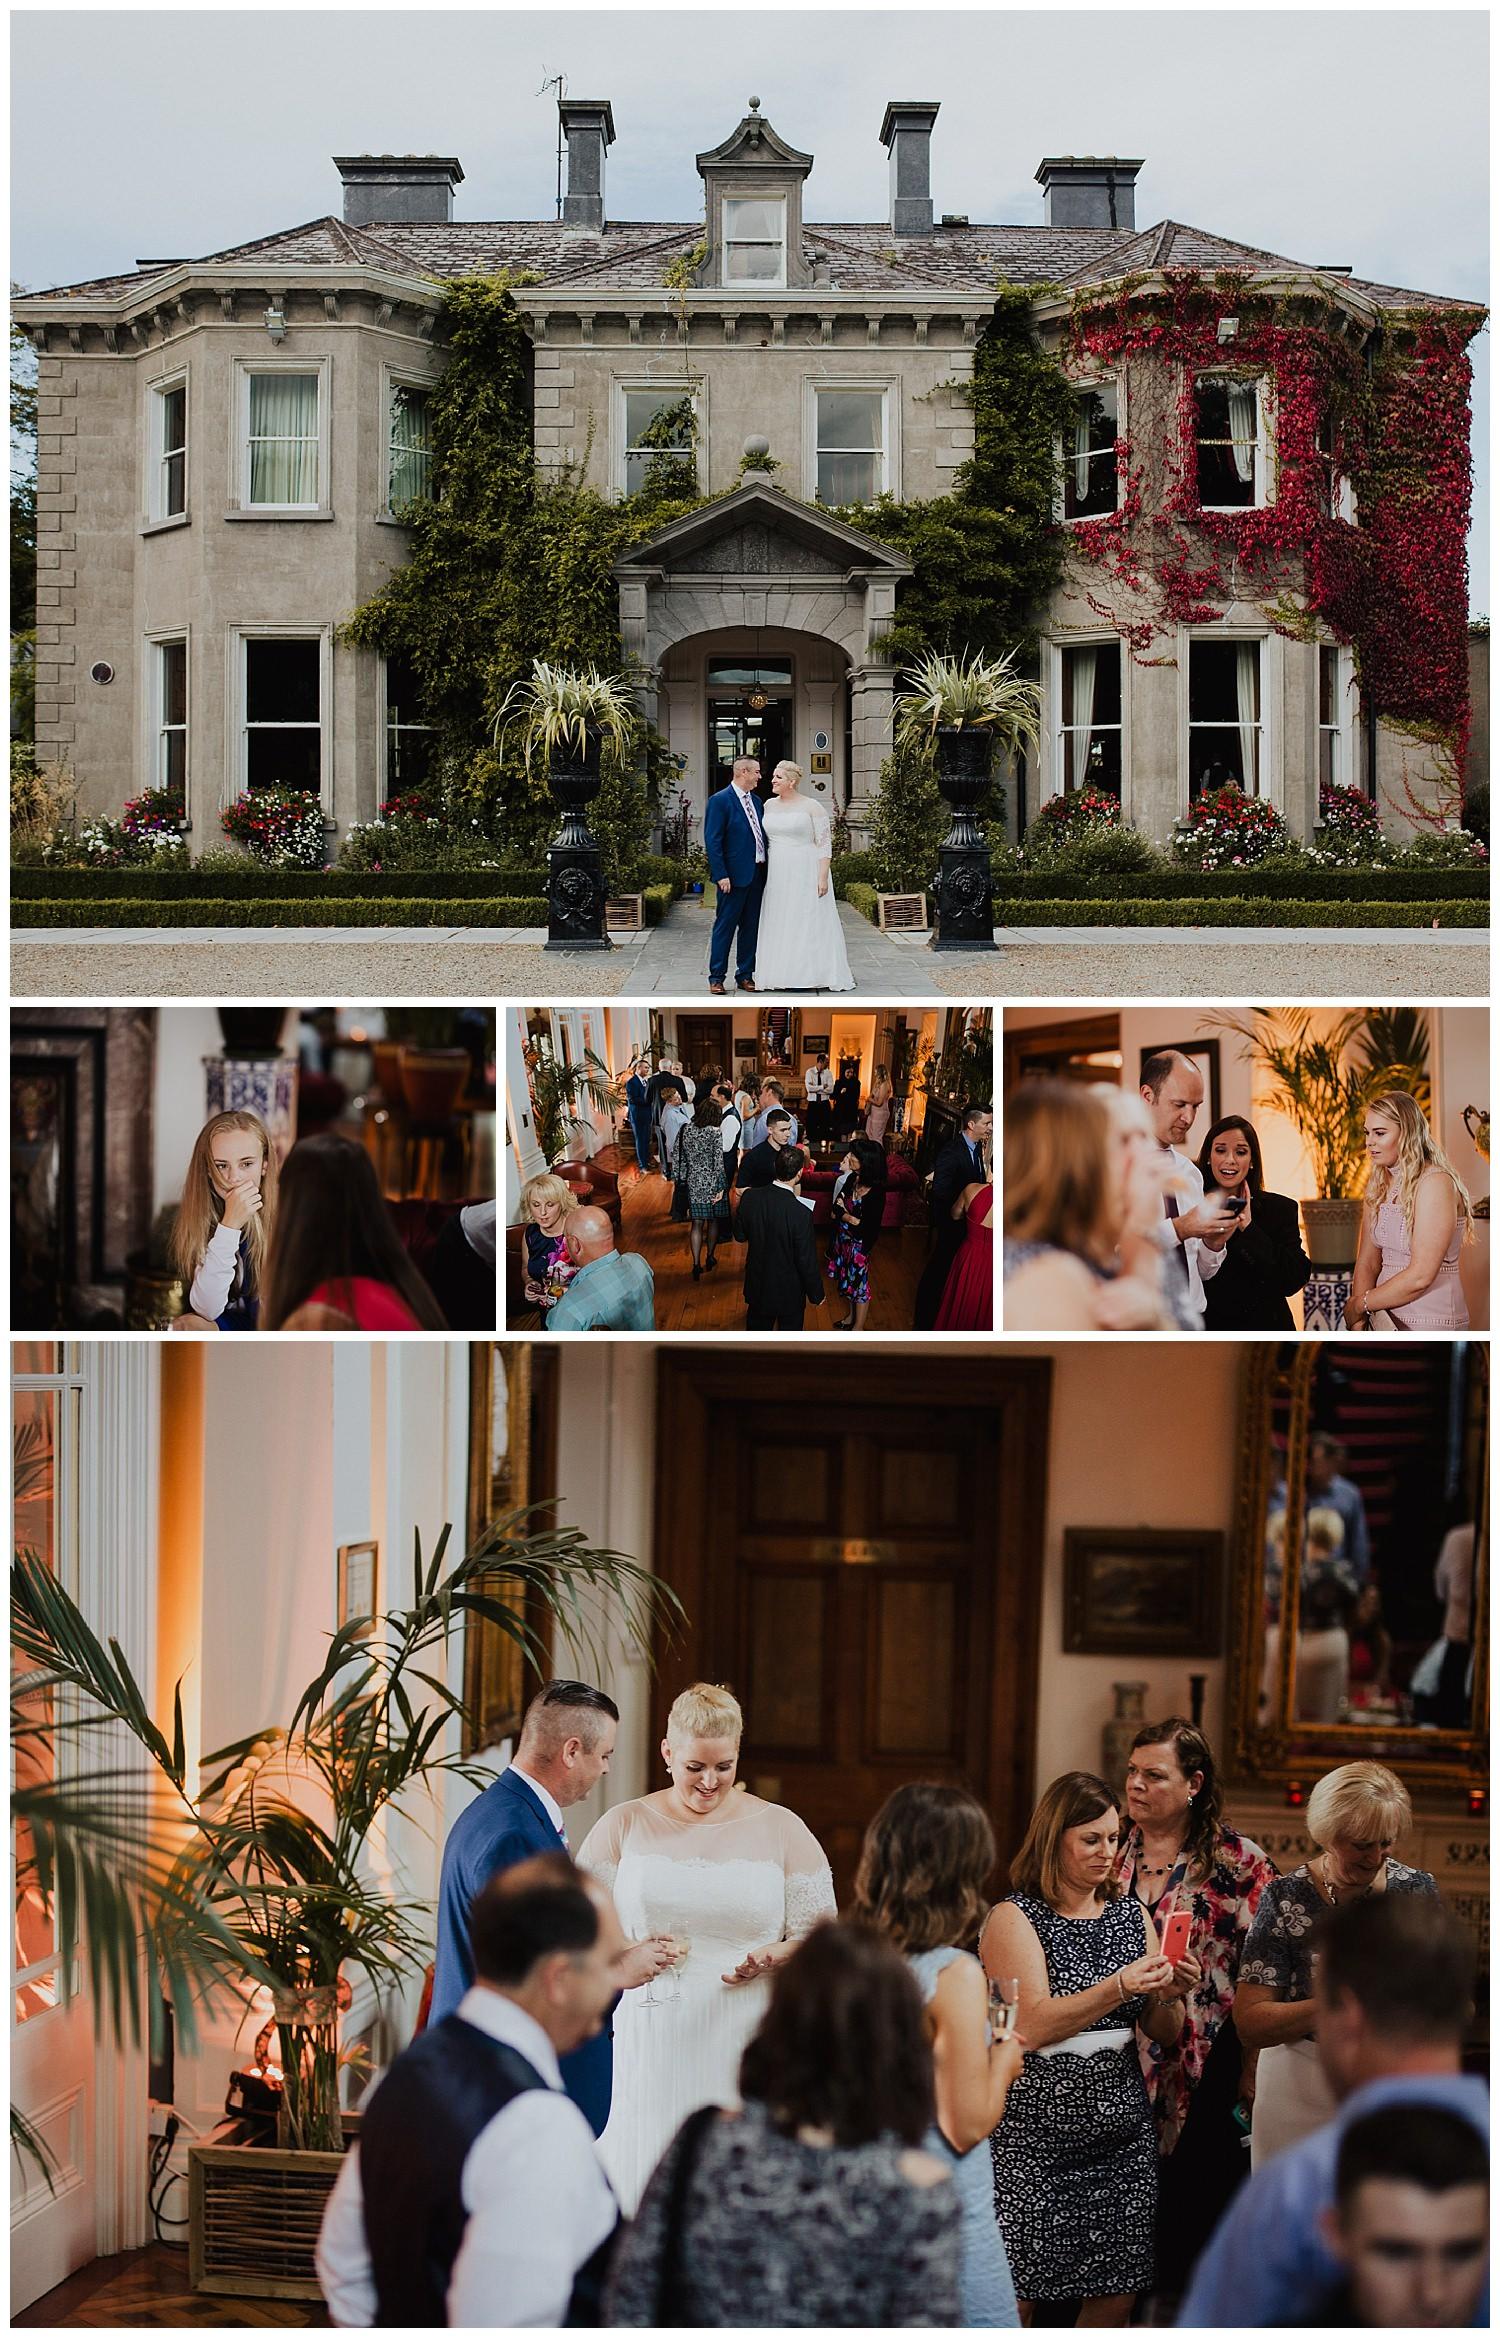 alternative_wedding_tinakilly_house_liviafigueiredo_495.jpg